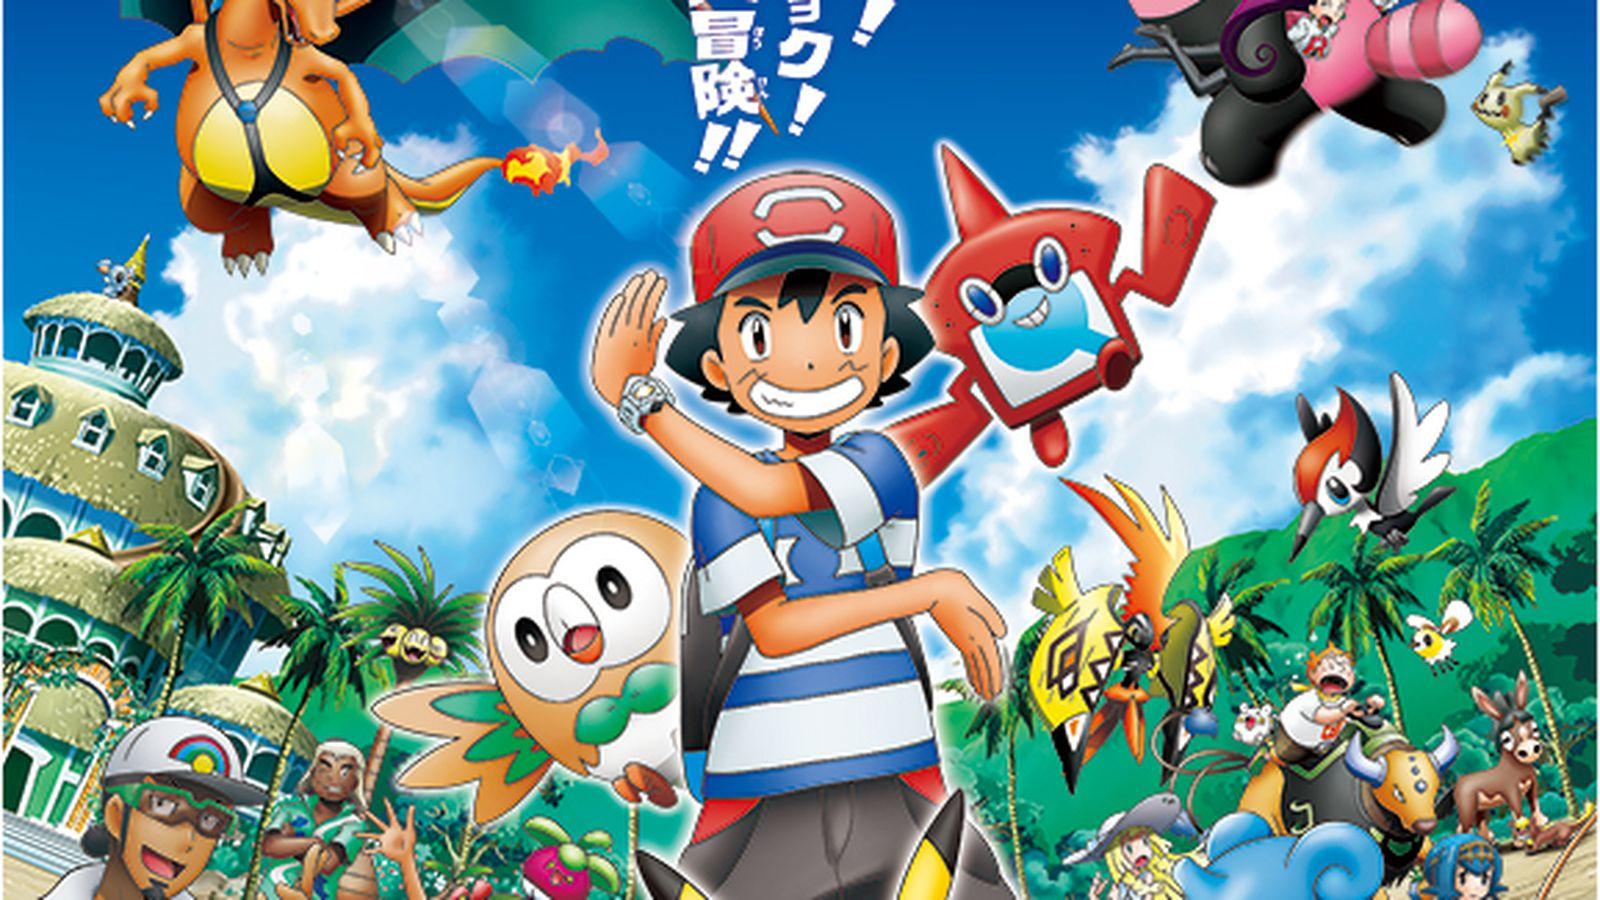 pokémon sun and moon anime airs stateside starting next month